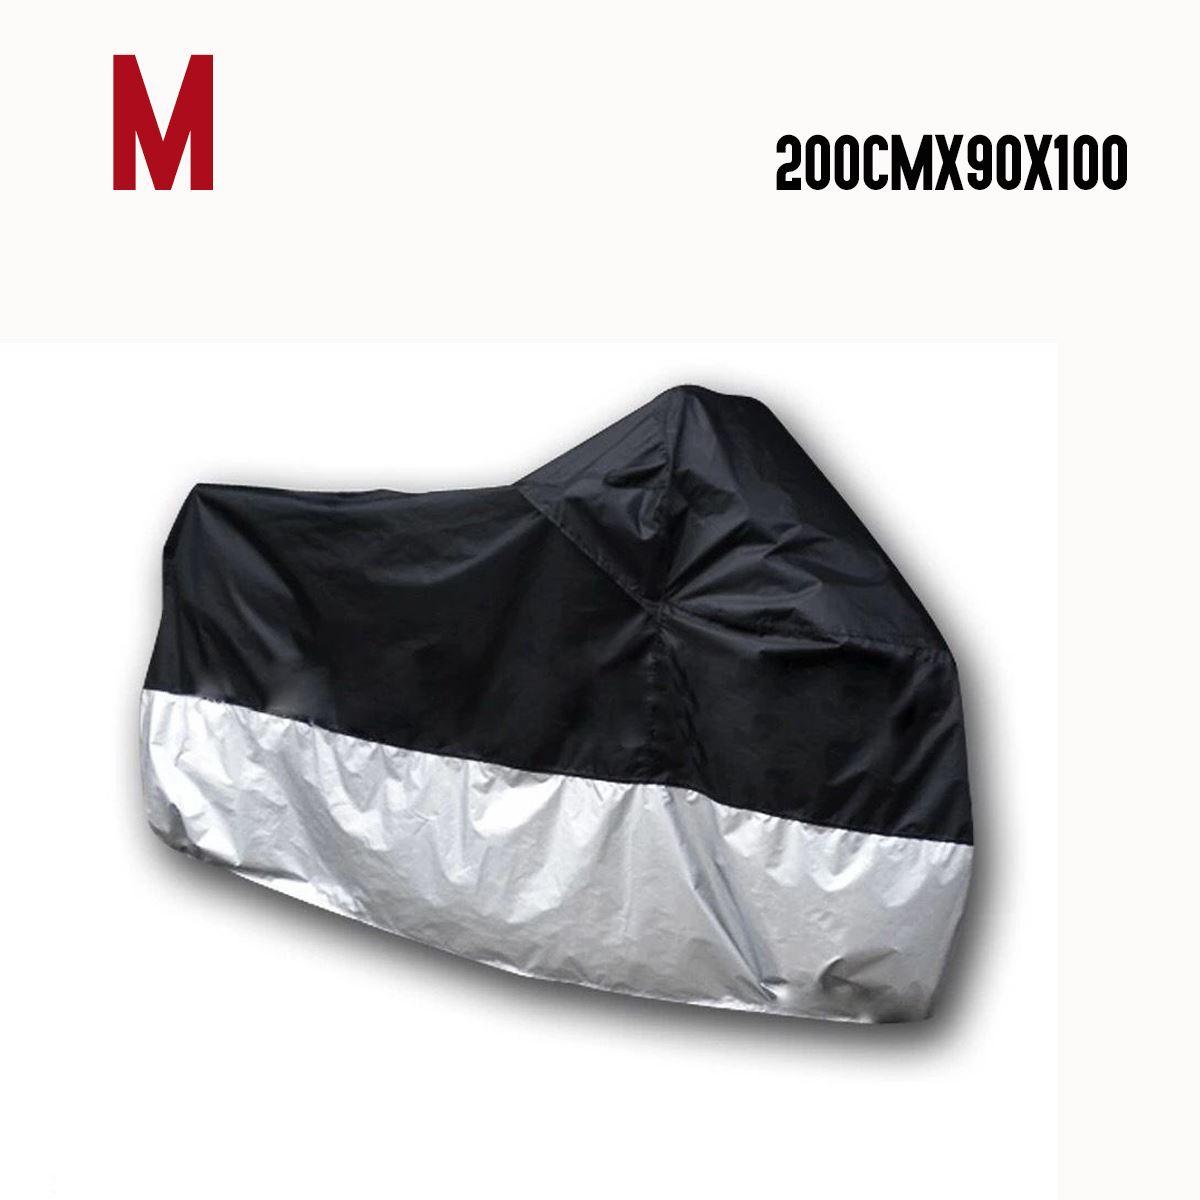 Funda-Impermeable-Protectora-Cubre-Moto-Cosida-Muy-Resistente-Tallas-M-XXL miniatura 3